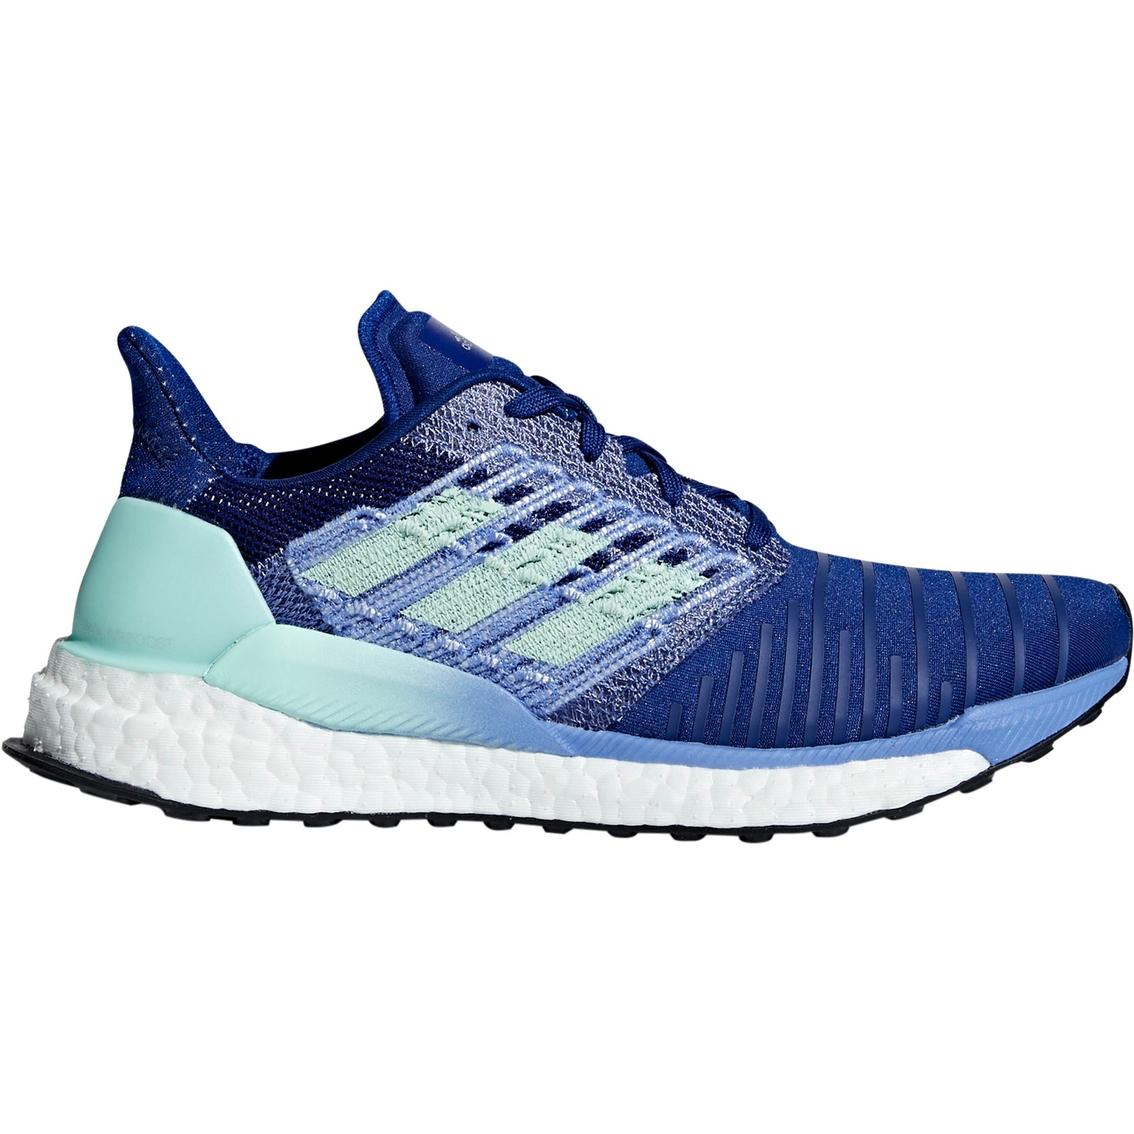 Adidas Women's Solar Boost Running Shoes | Running | Shoes